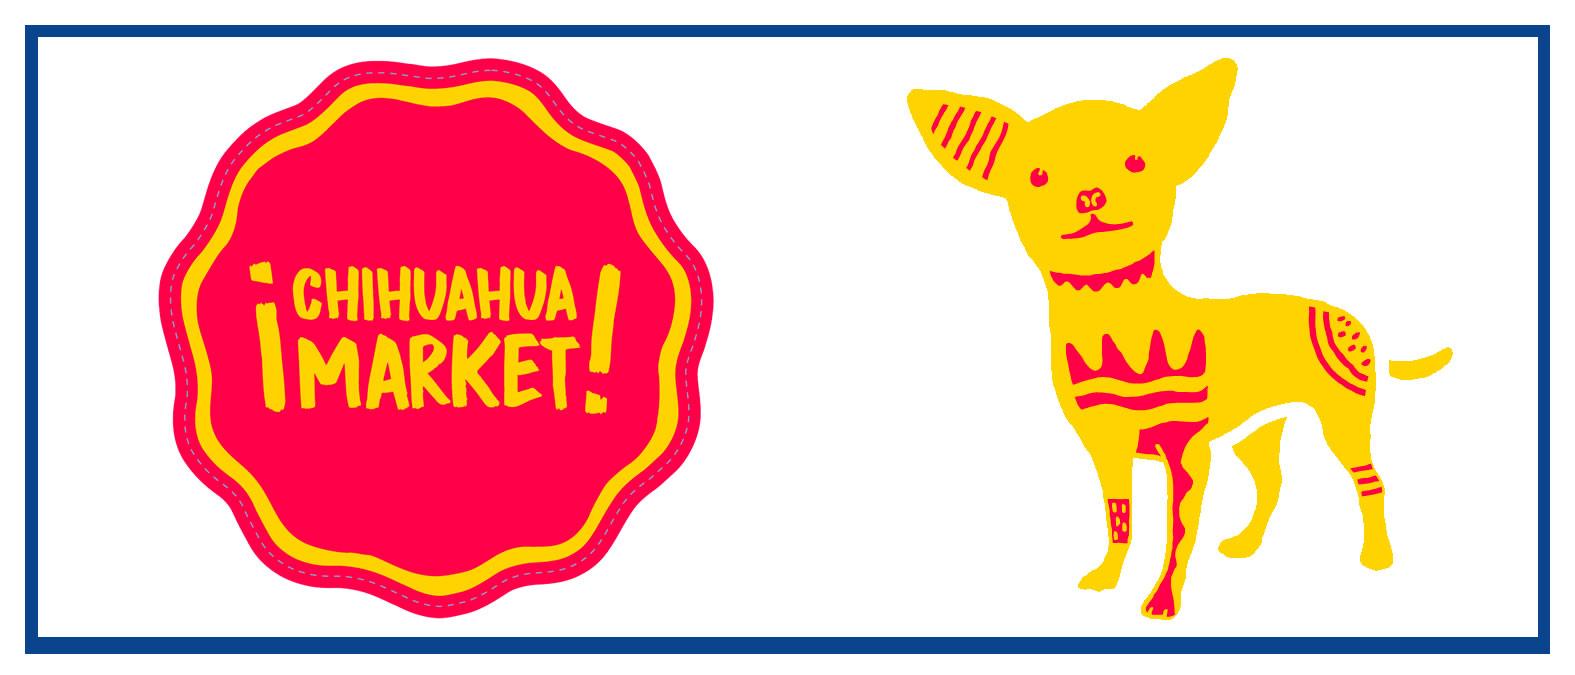 Chihuahua Market.jpg